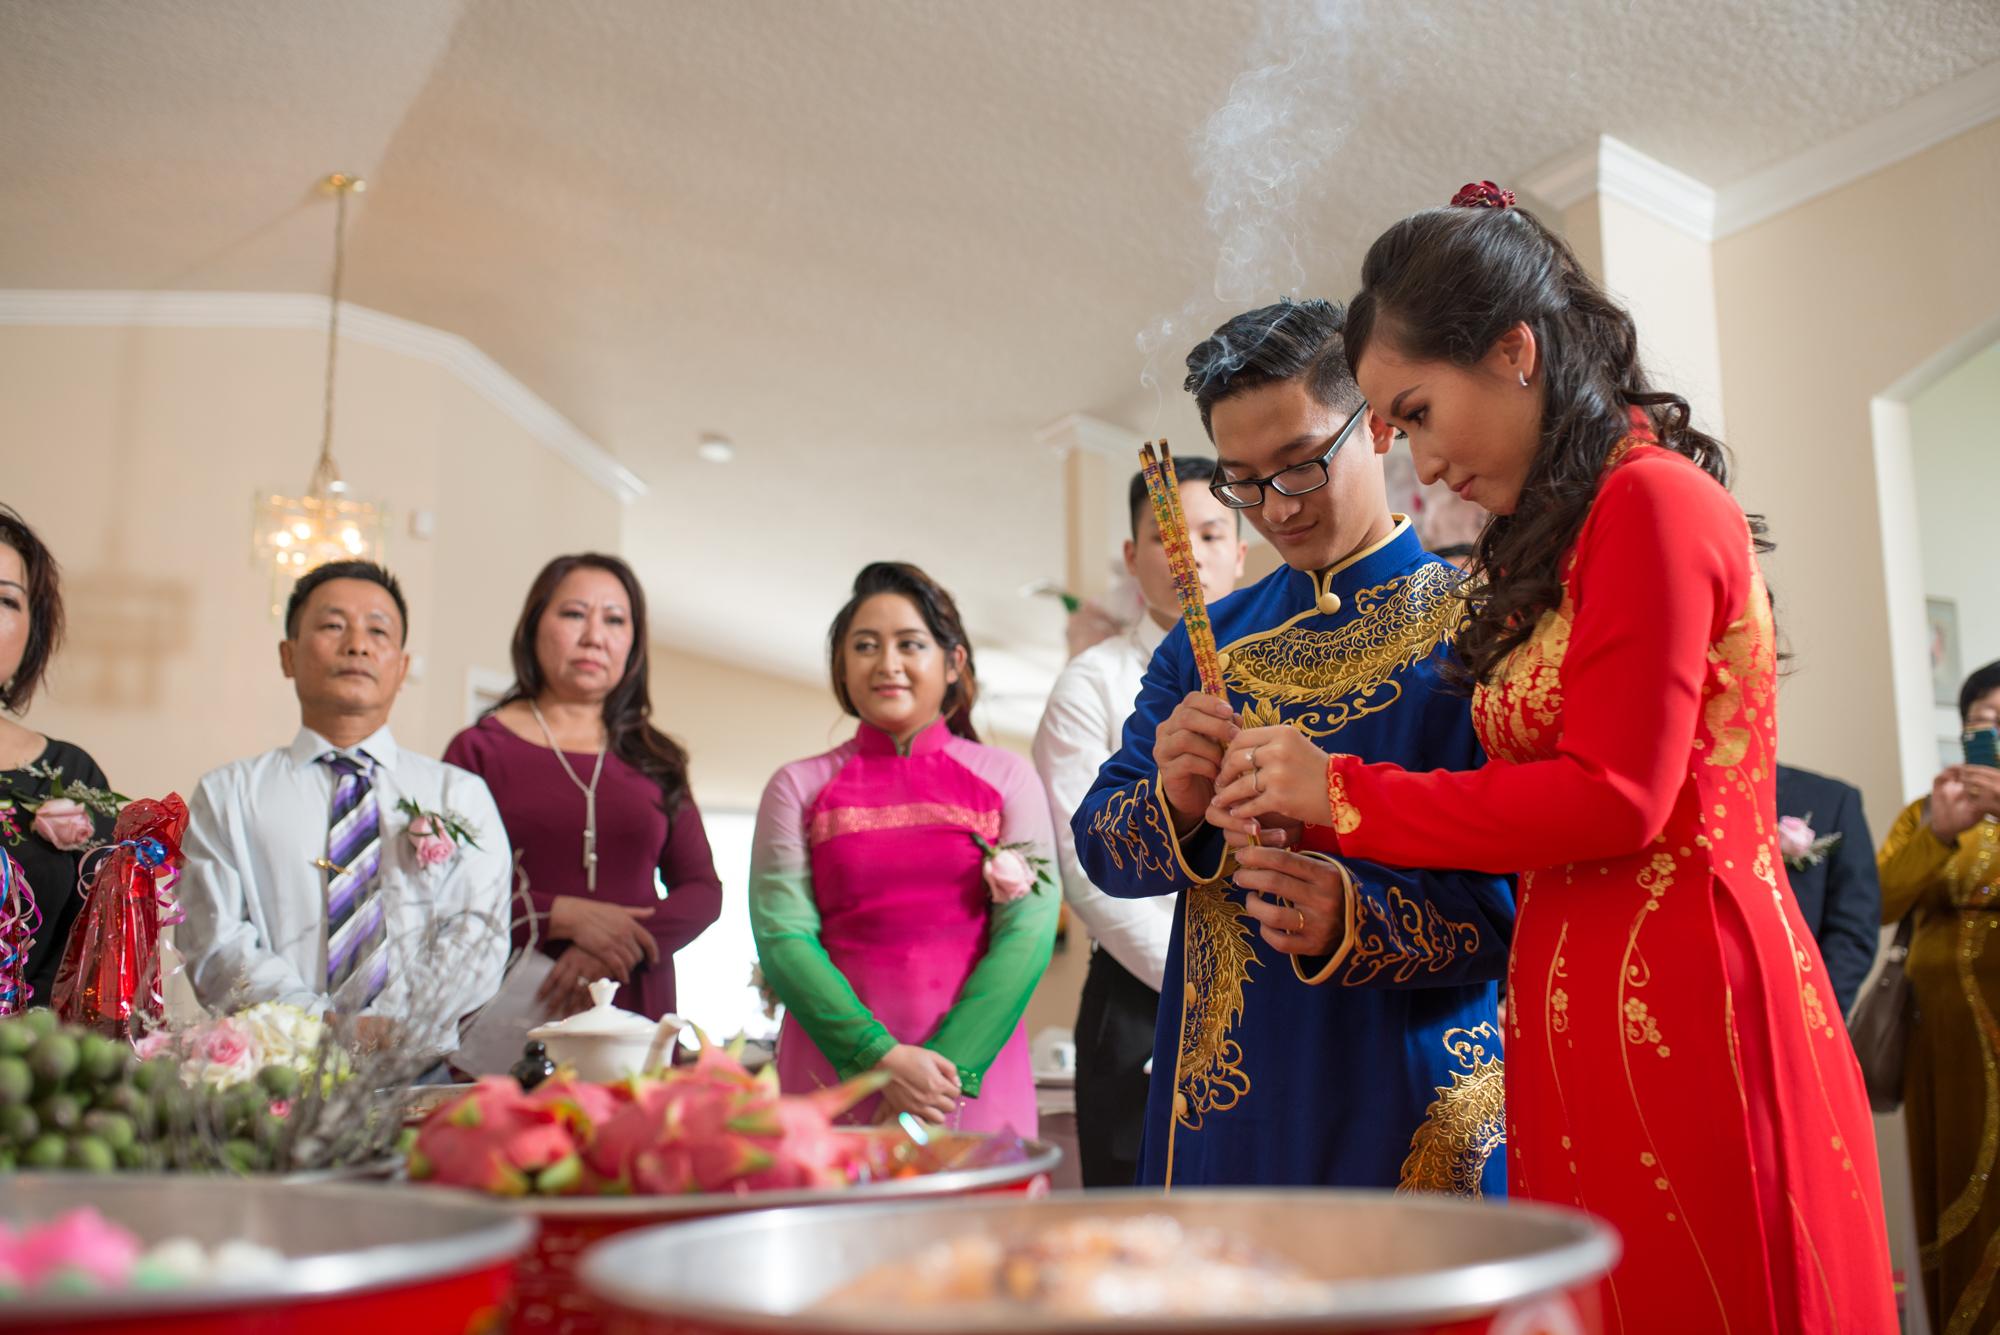 Vietnamese wedding gift etiquette